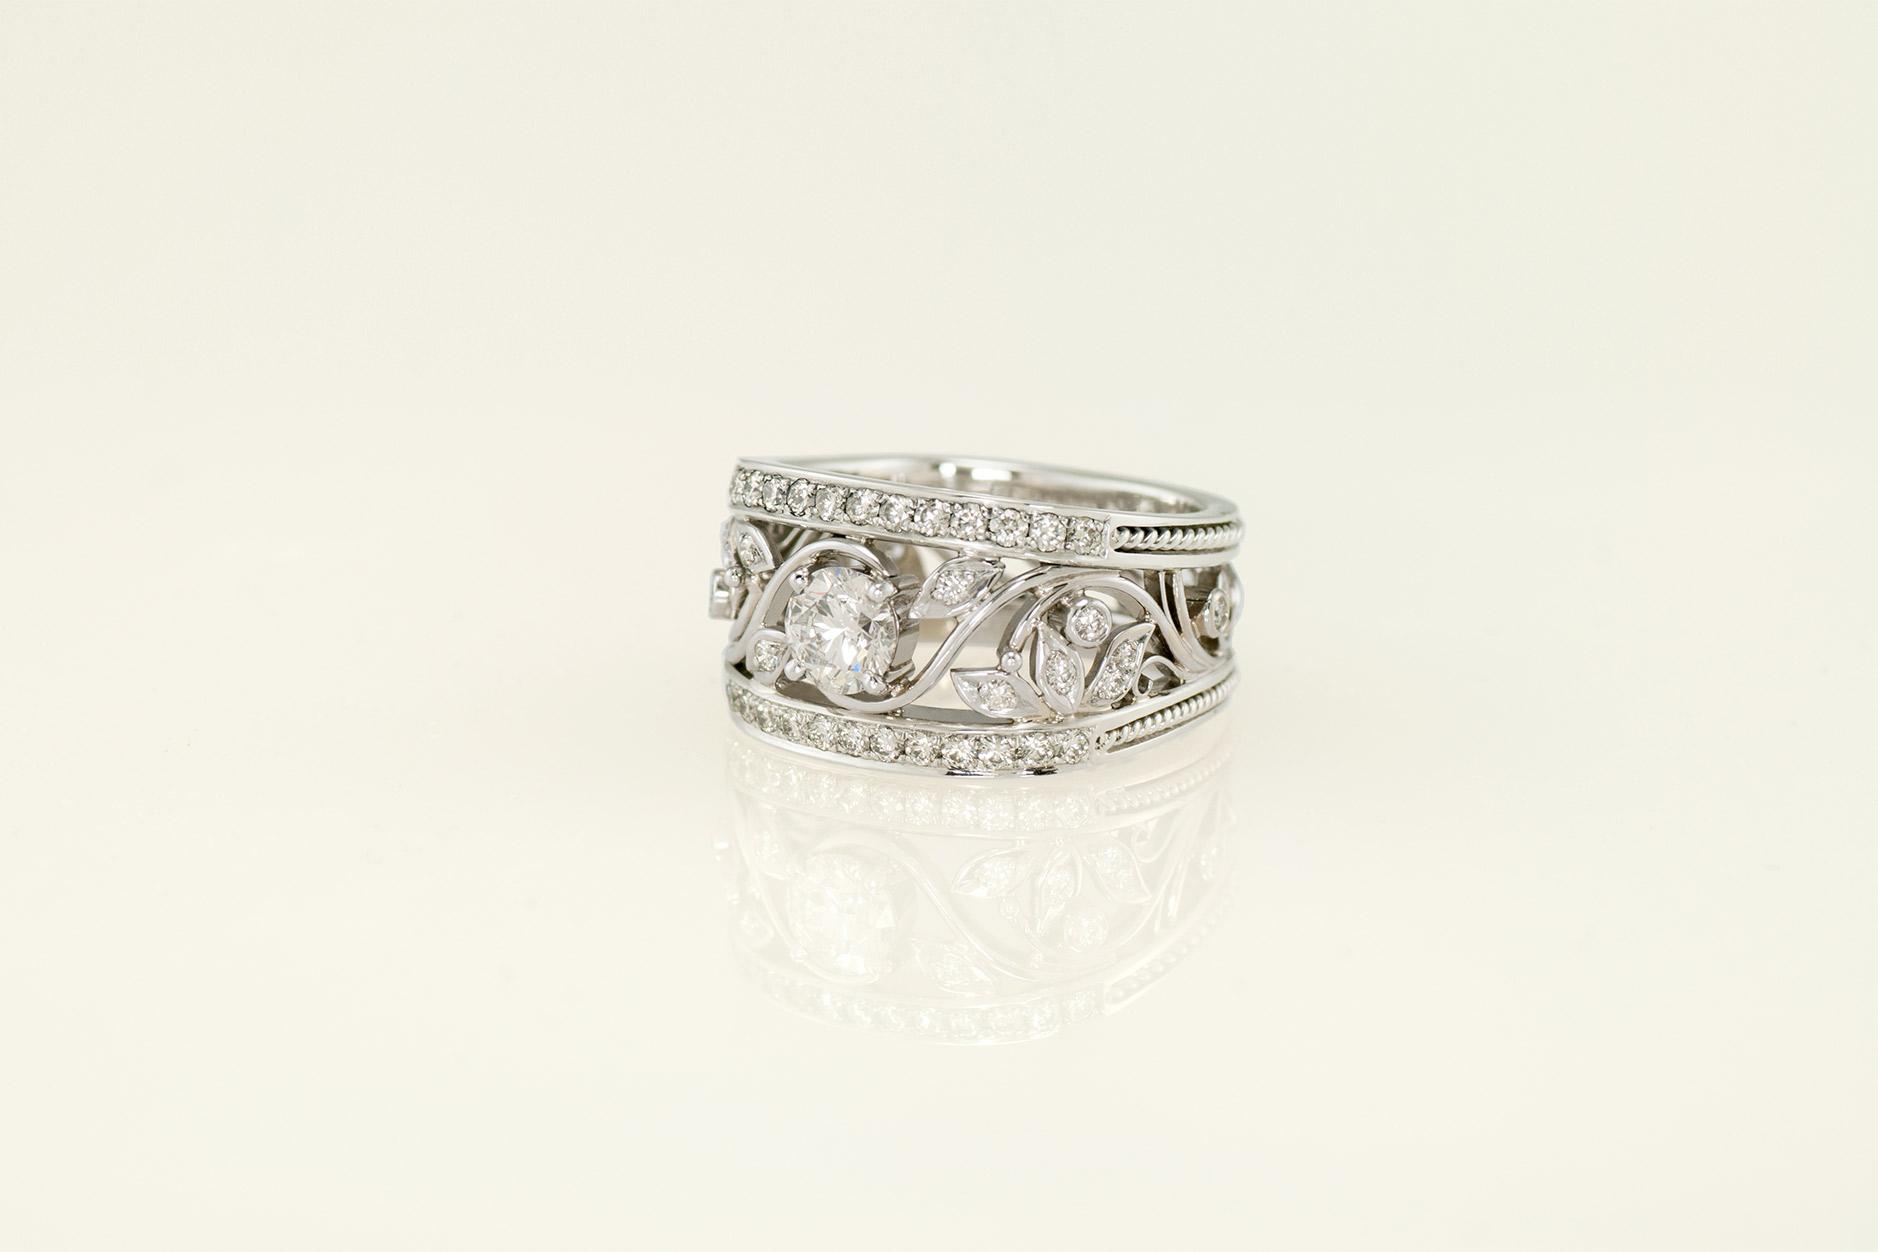 Handcrafted Diamond Custom Made Platinum Leaf and Vine Ring - NEWA Goldsmtih